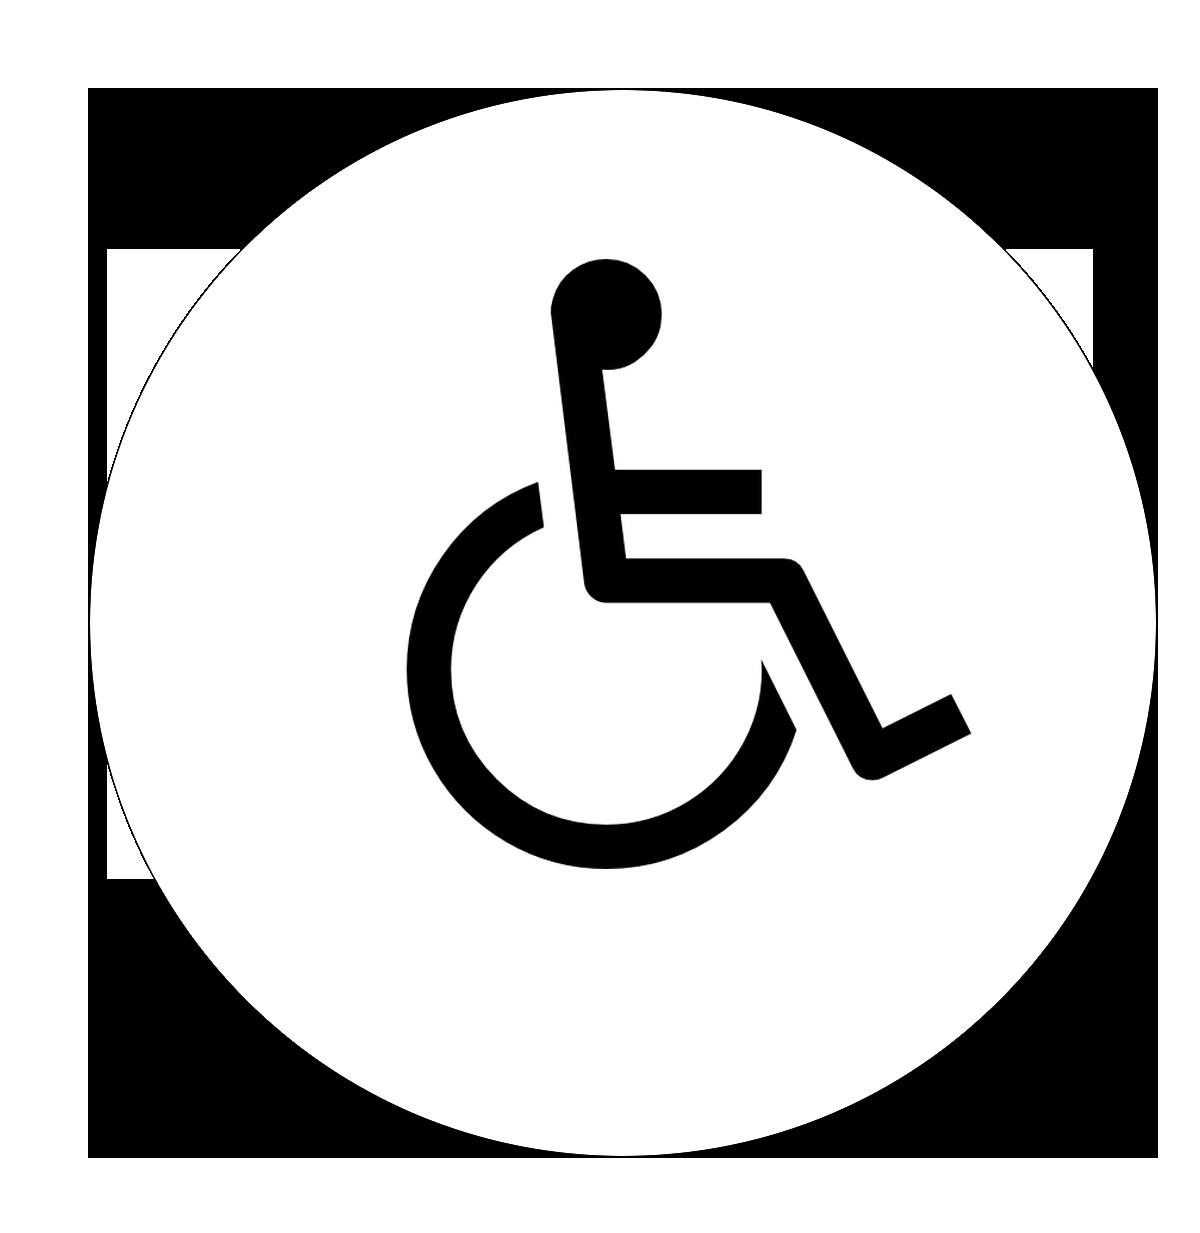 Rollstuhltransport